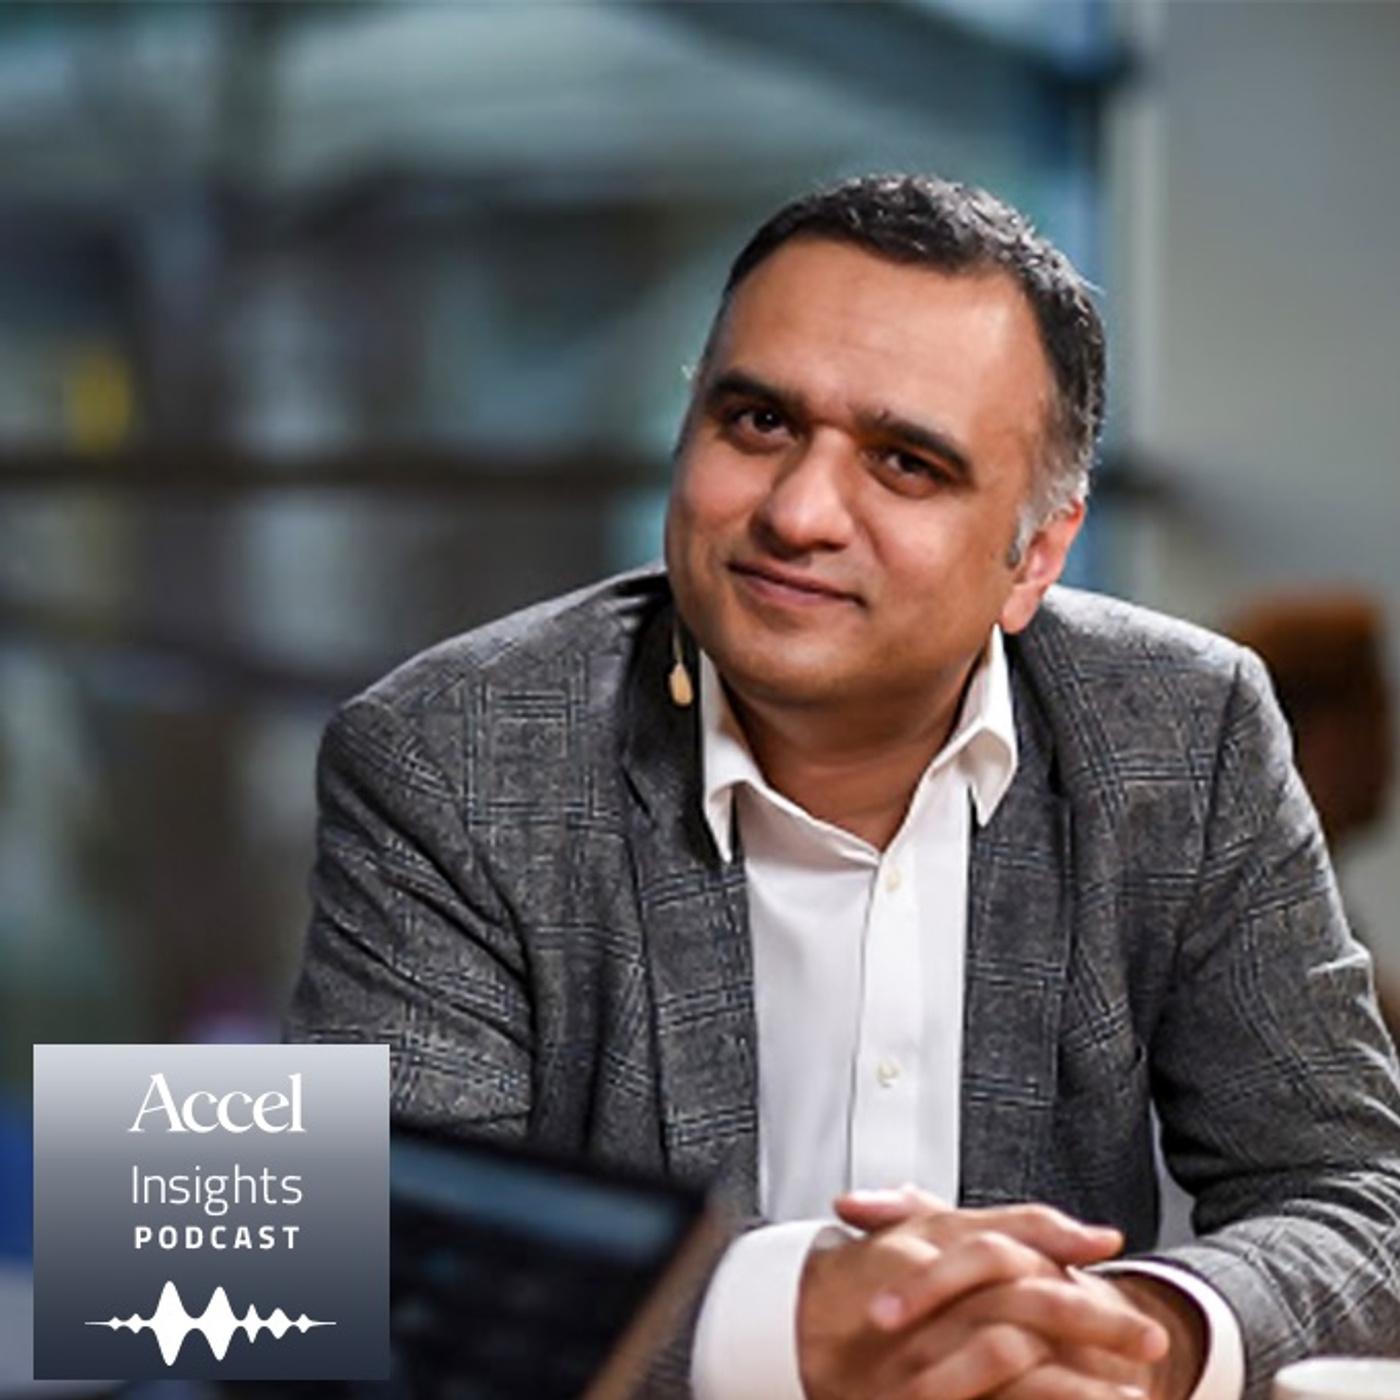 INSIGHTS #41 — Dheeraj Pandey, Nutanix on thinking long-term to build a generational company